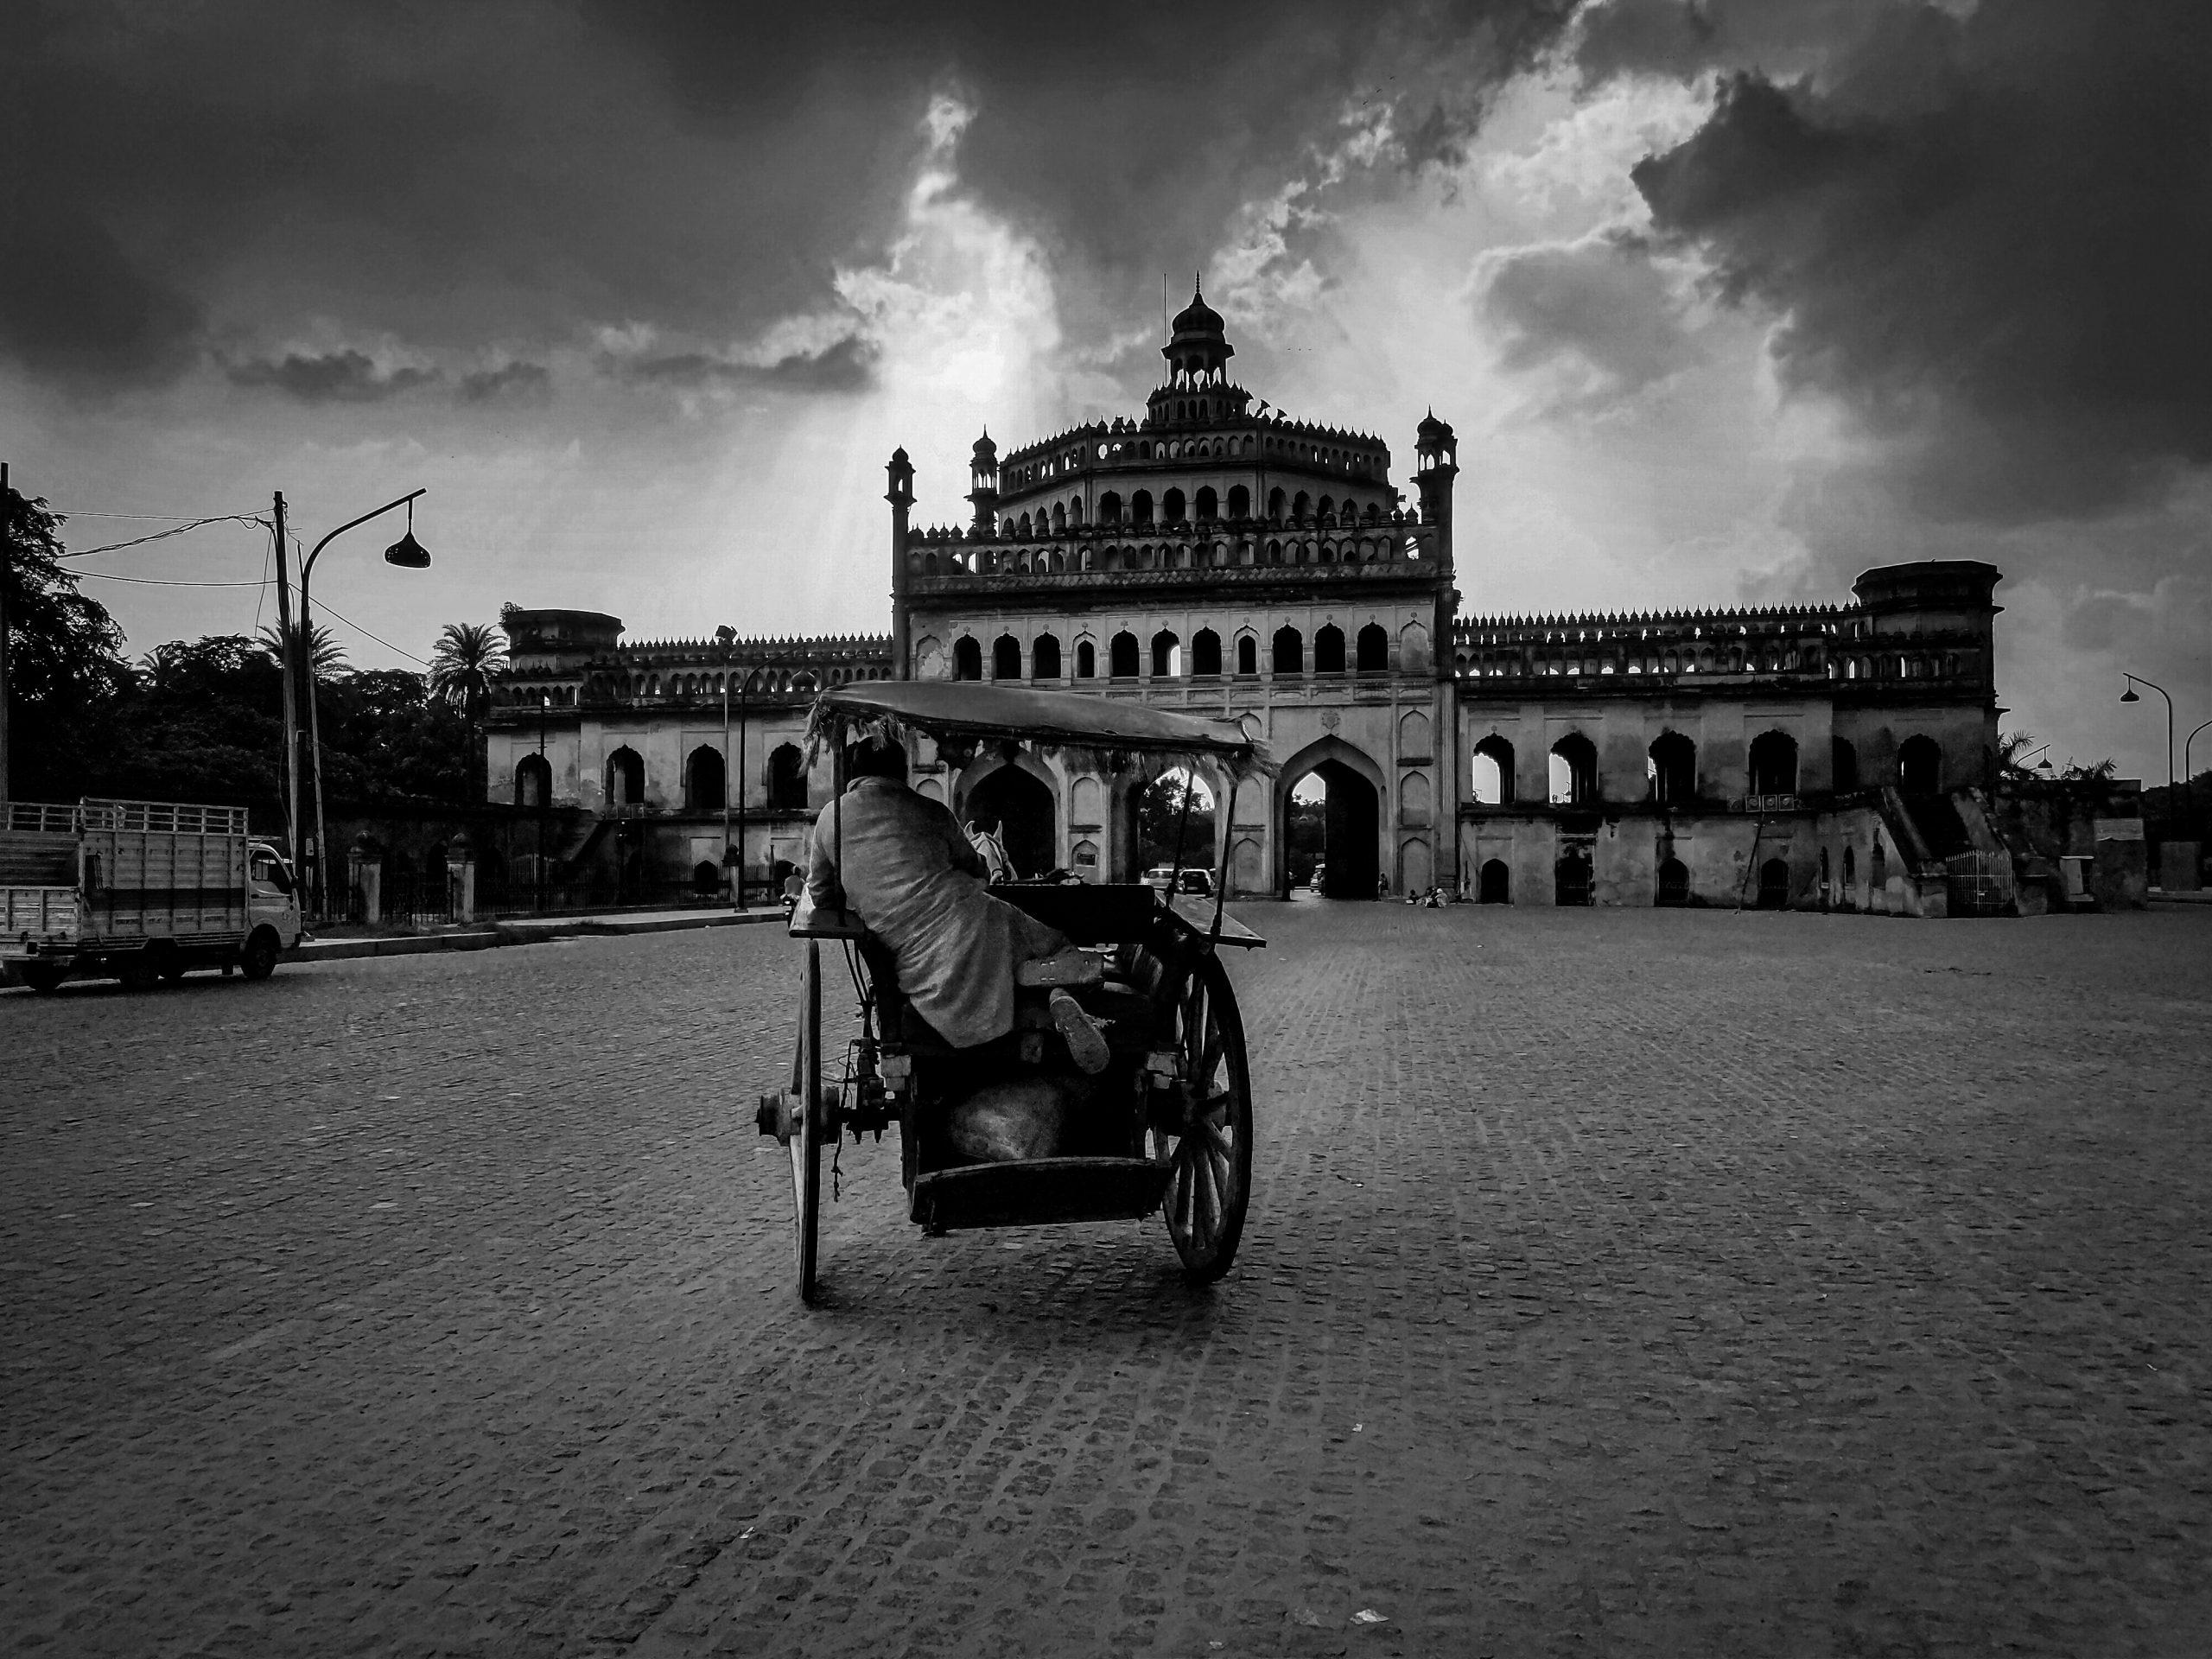 A cart near a historic building